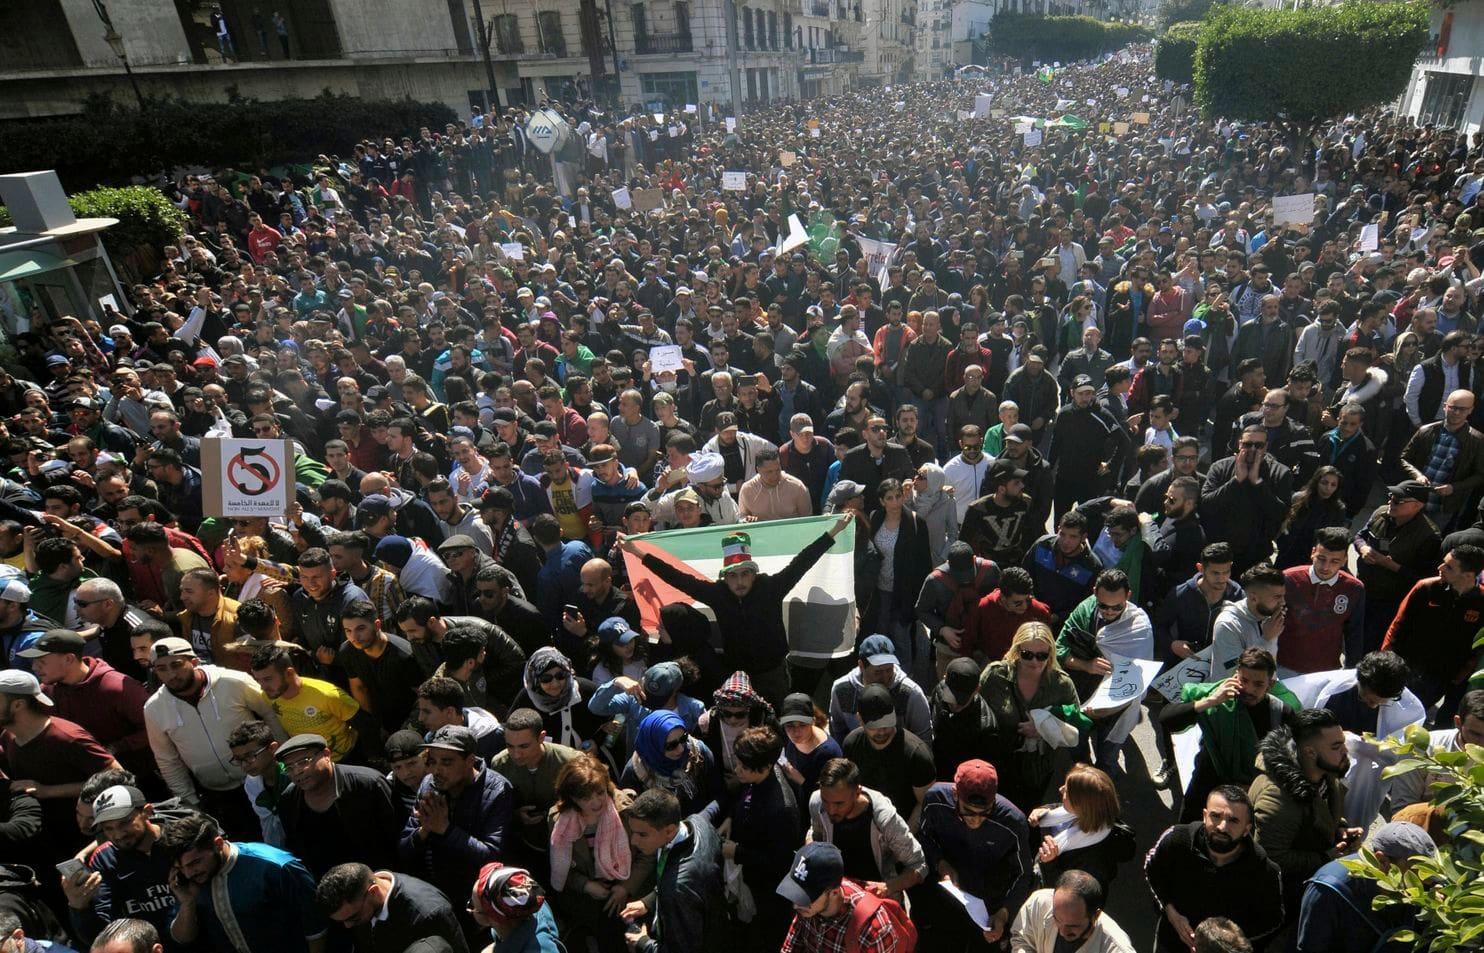 Tens of thousands denounce president